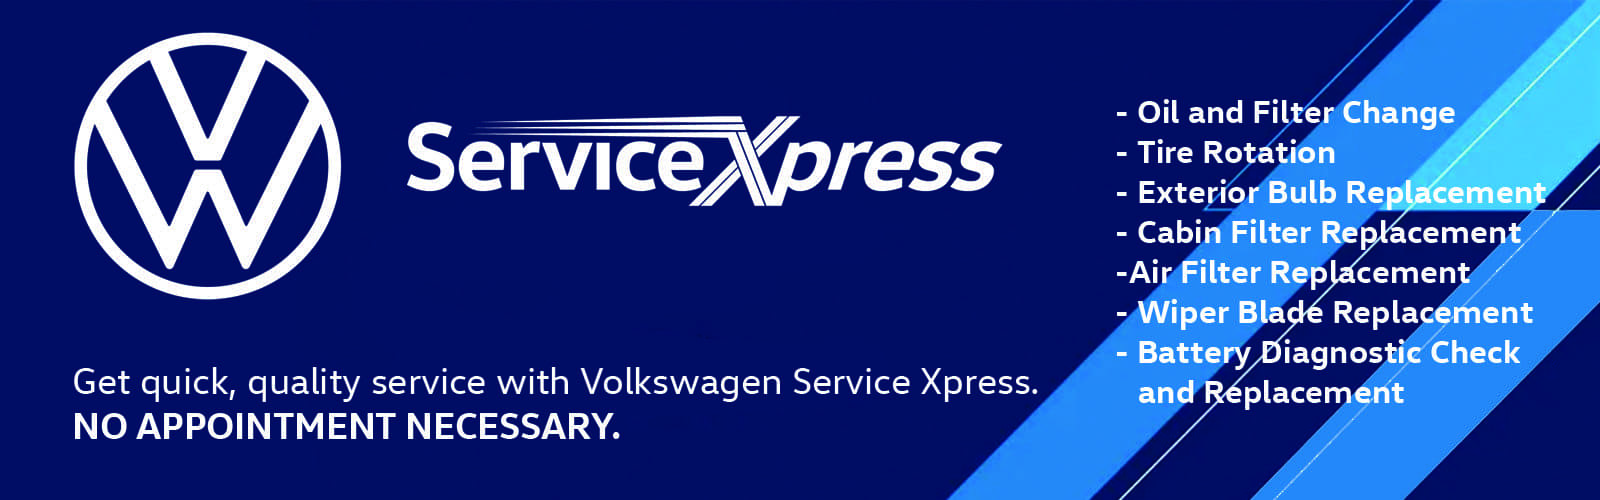 xpress service banner